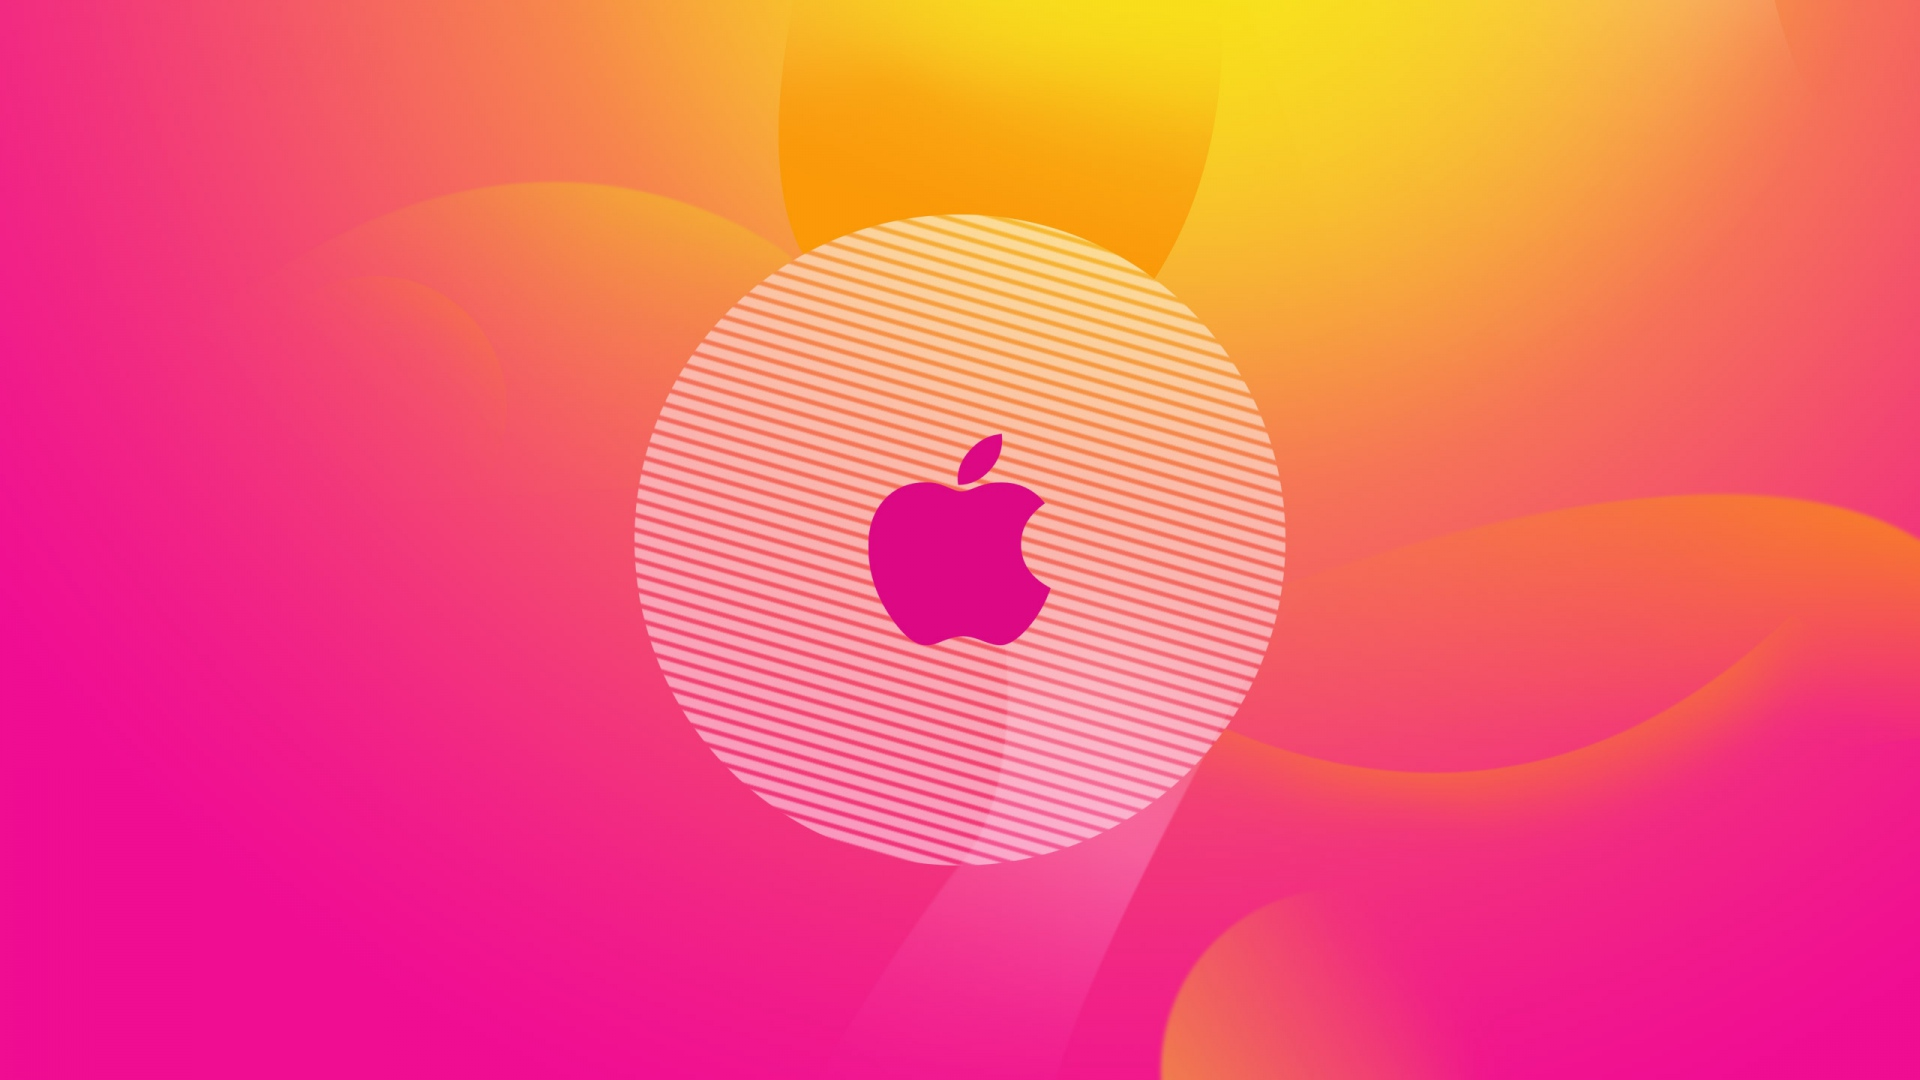 hd hintergrundbilder apple logo rosa rund klar 1920x1080